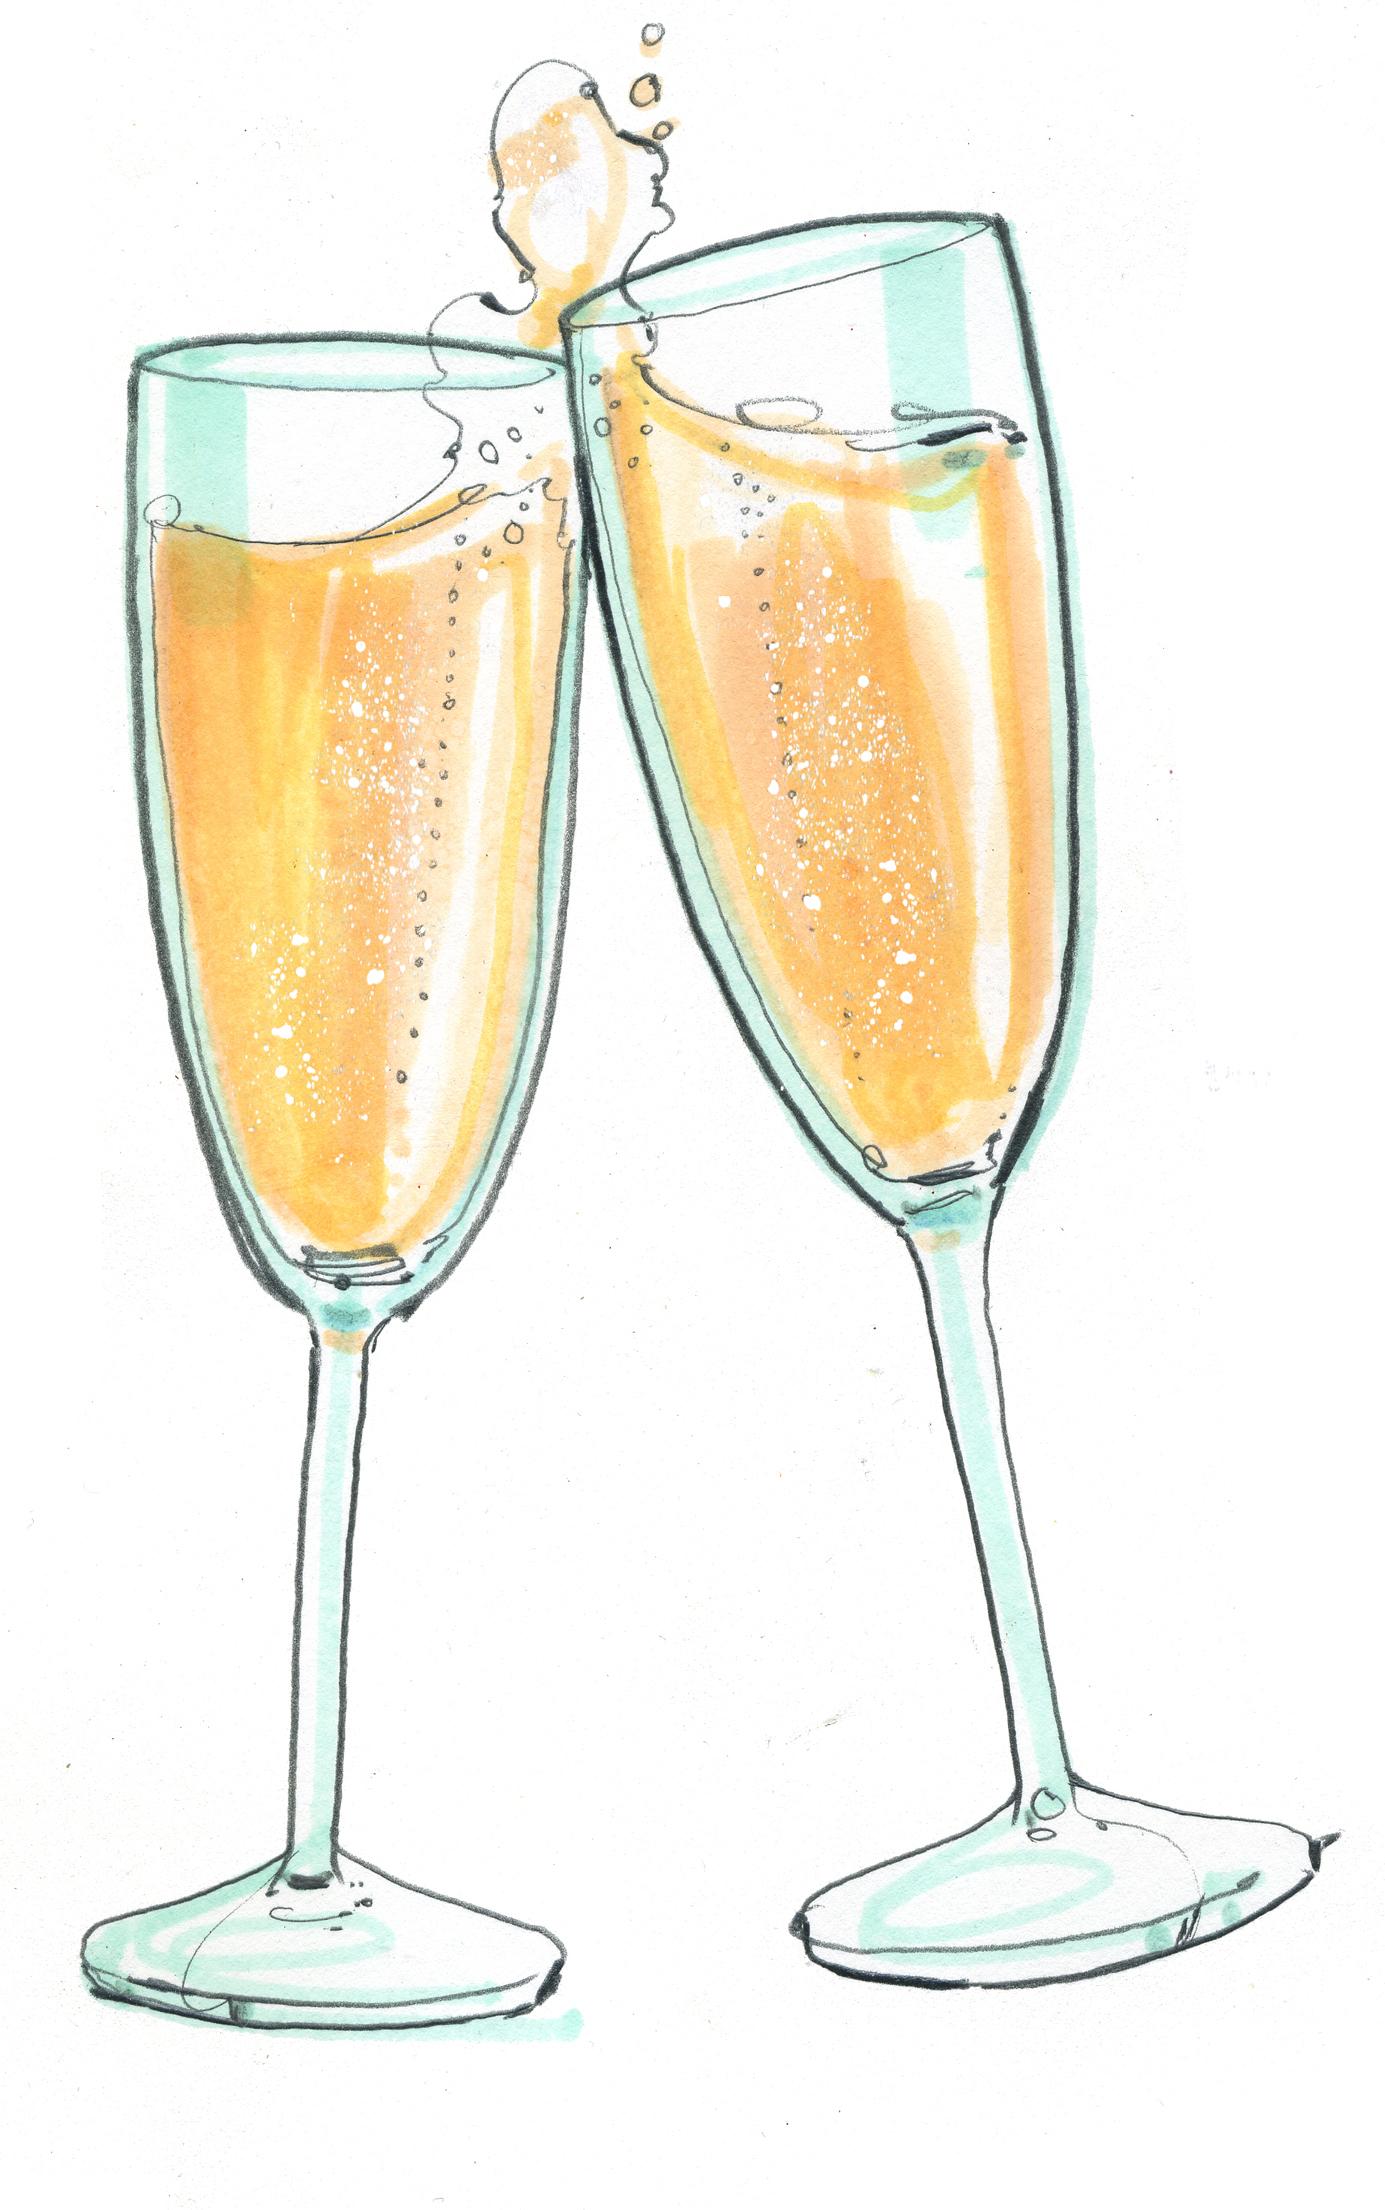 Ocado champagne flute.jpg